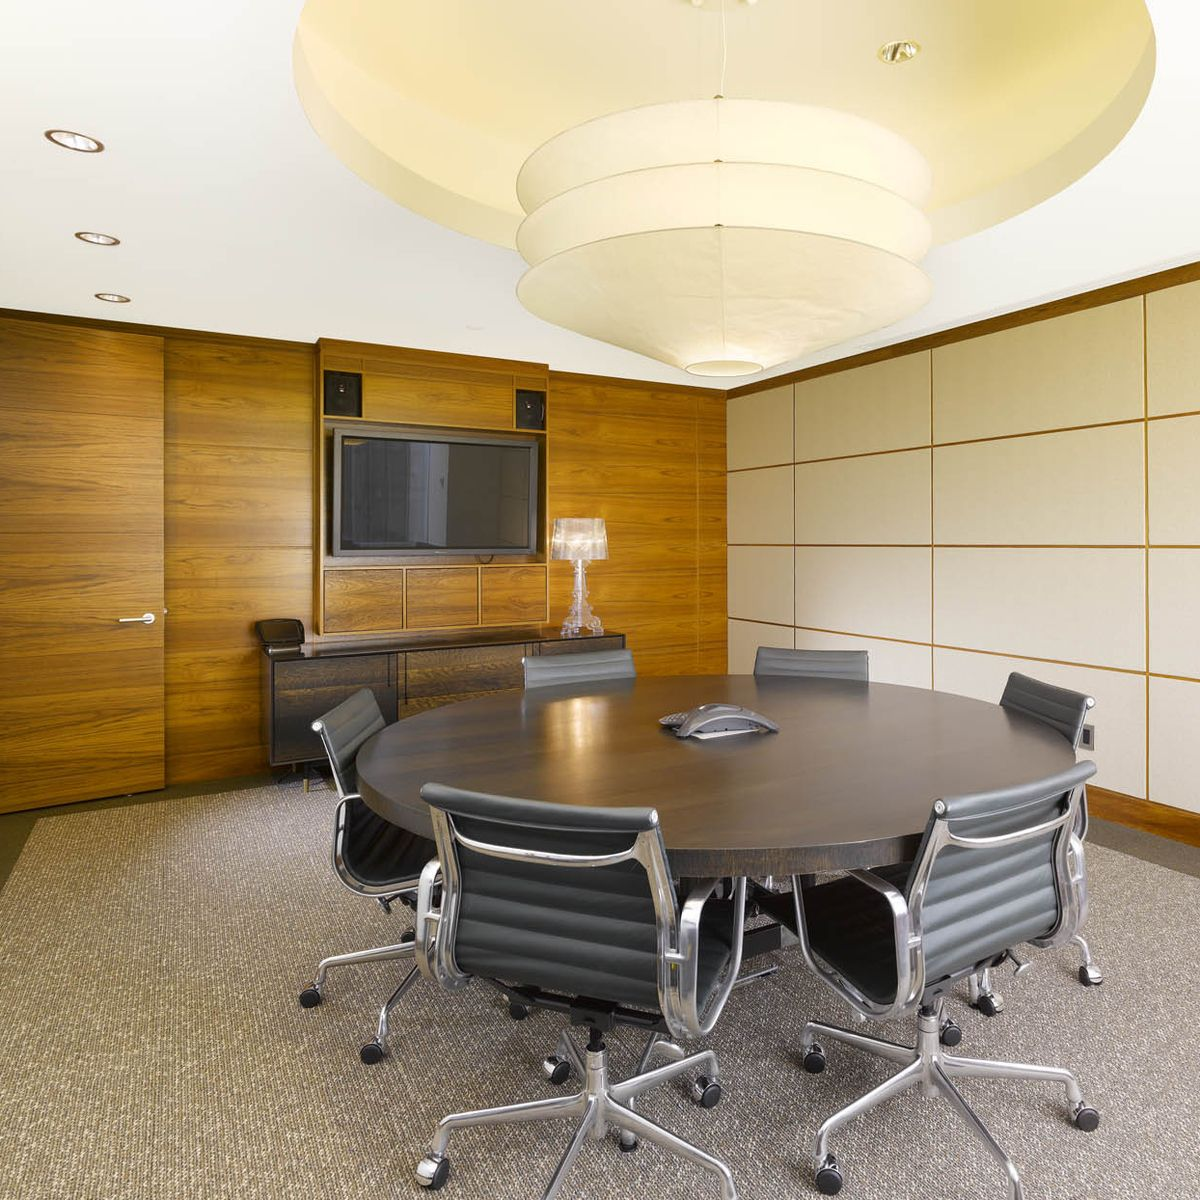 Commercial interior design firms london for Interior design recruitment agencies birmingham